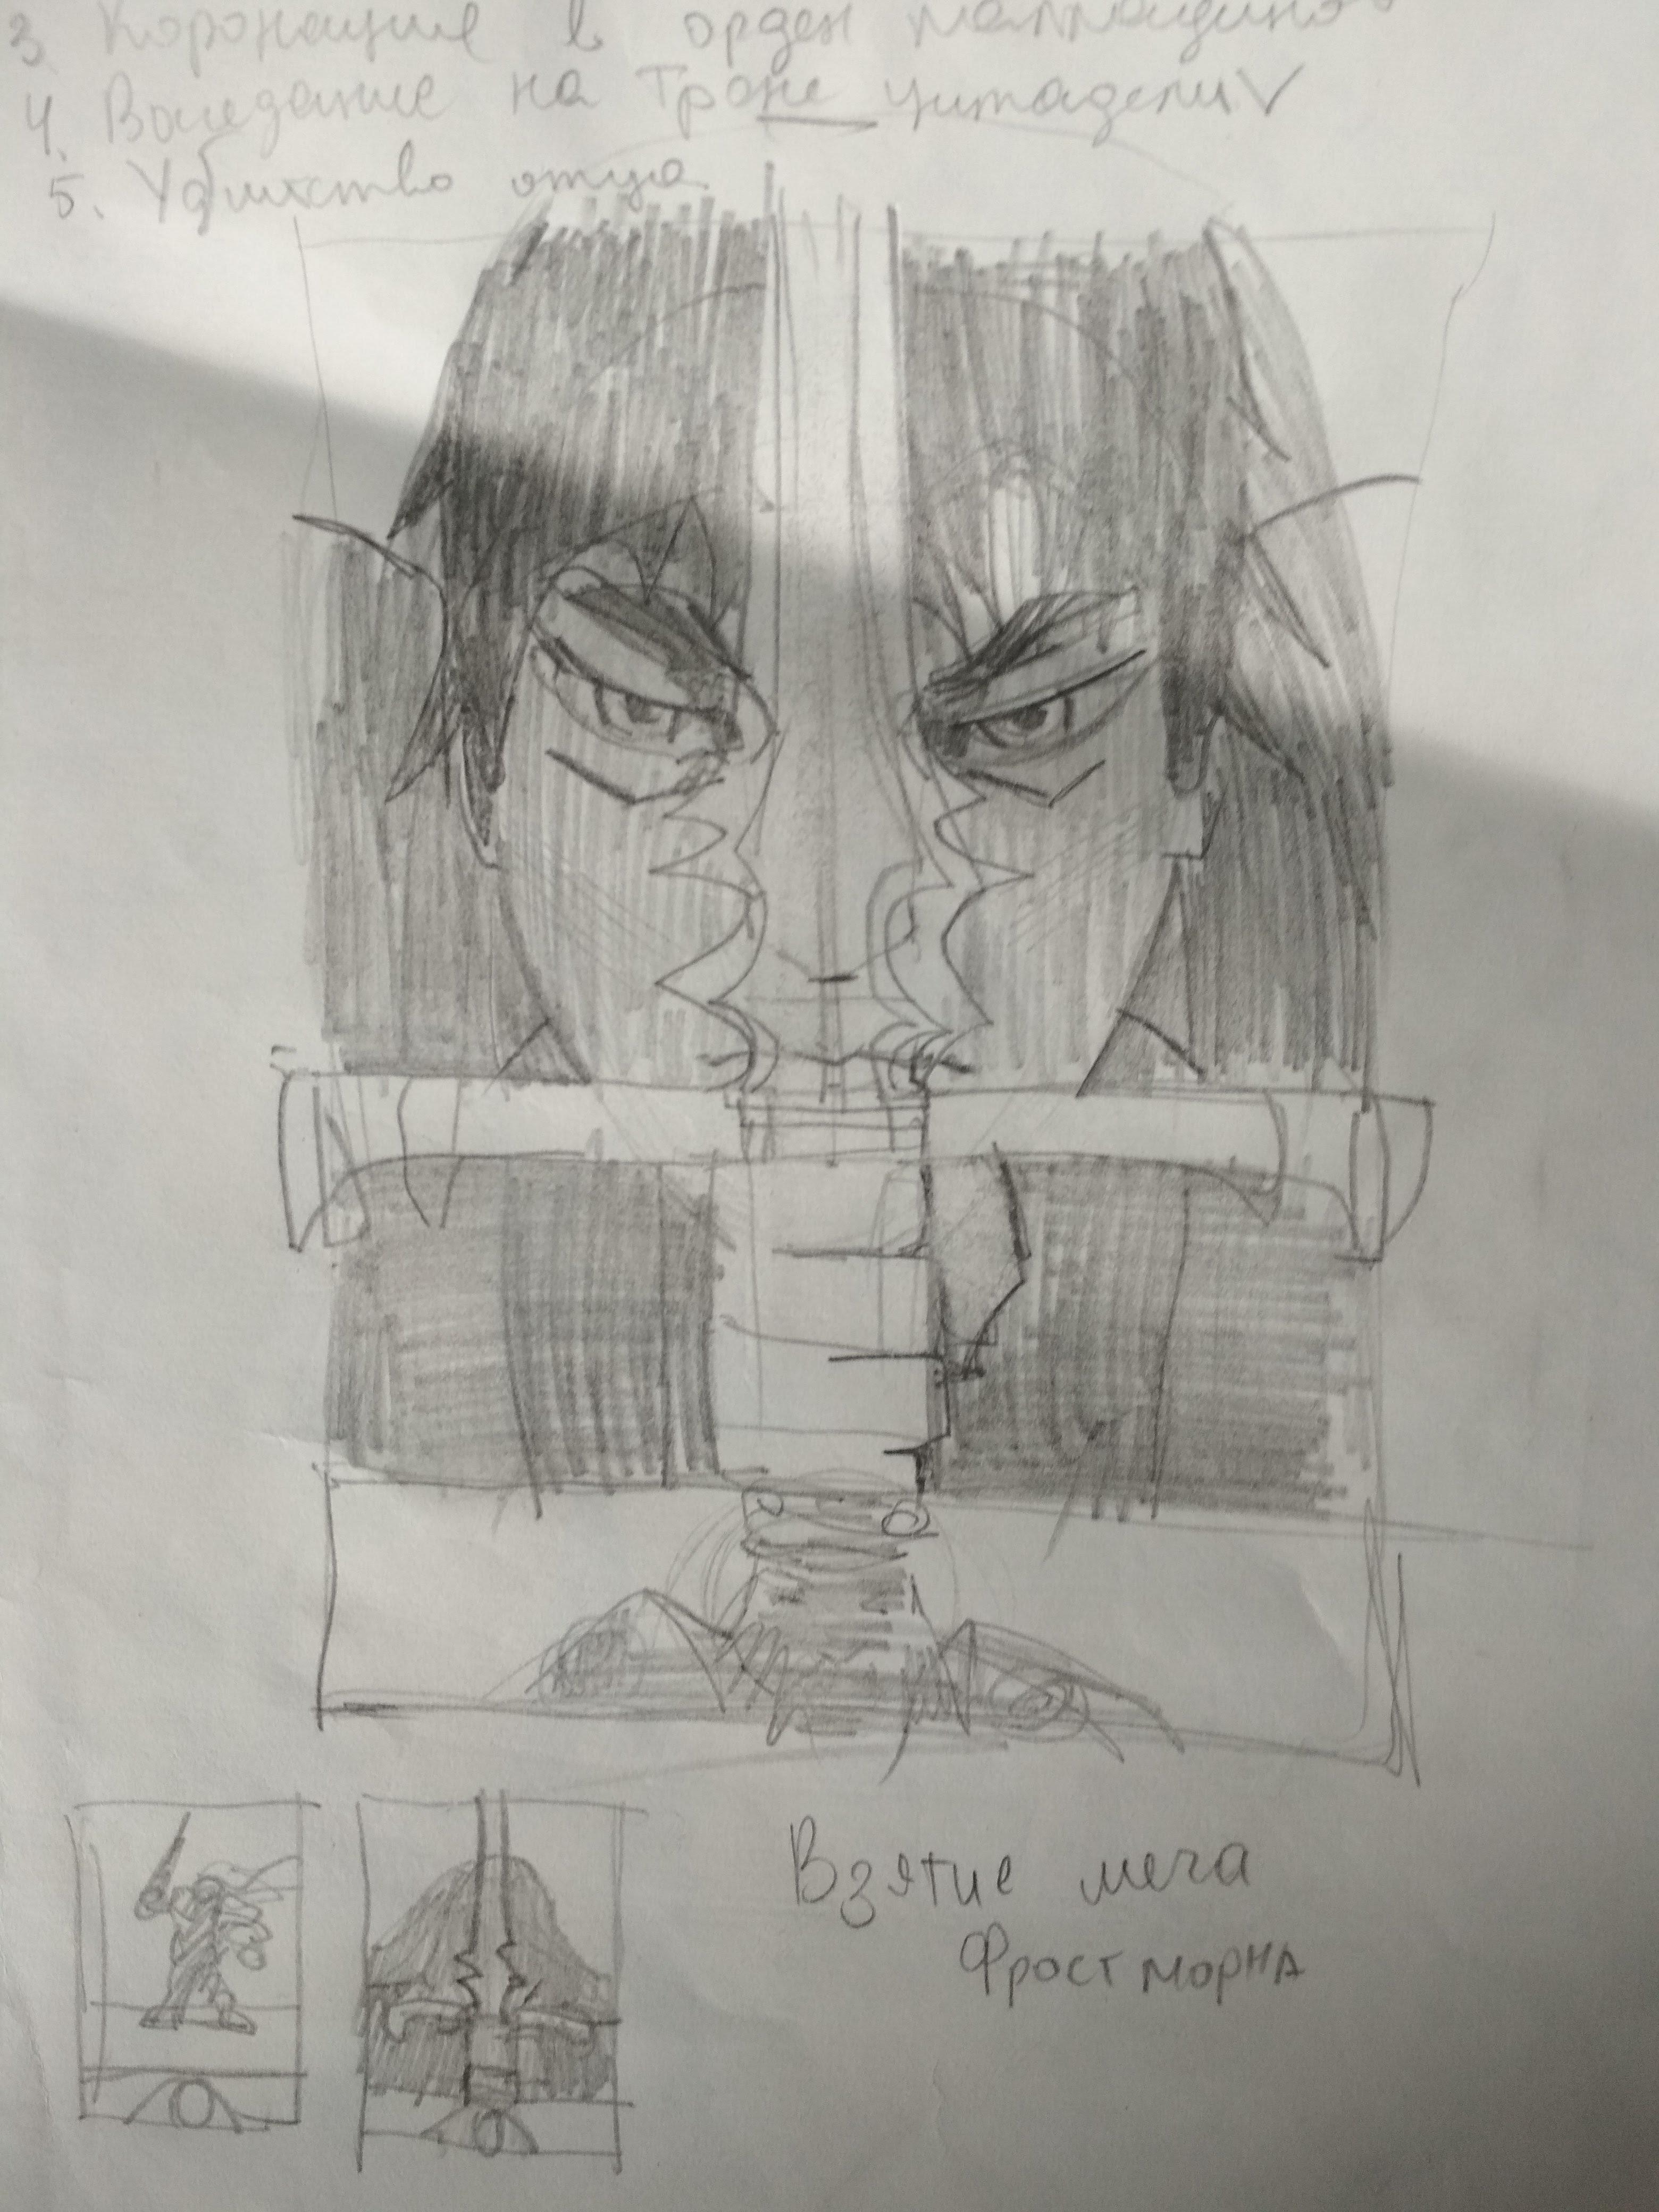 http://xgm.guru/p/art/blayderman-arthas-rotlk